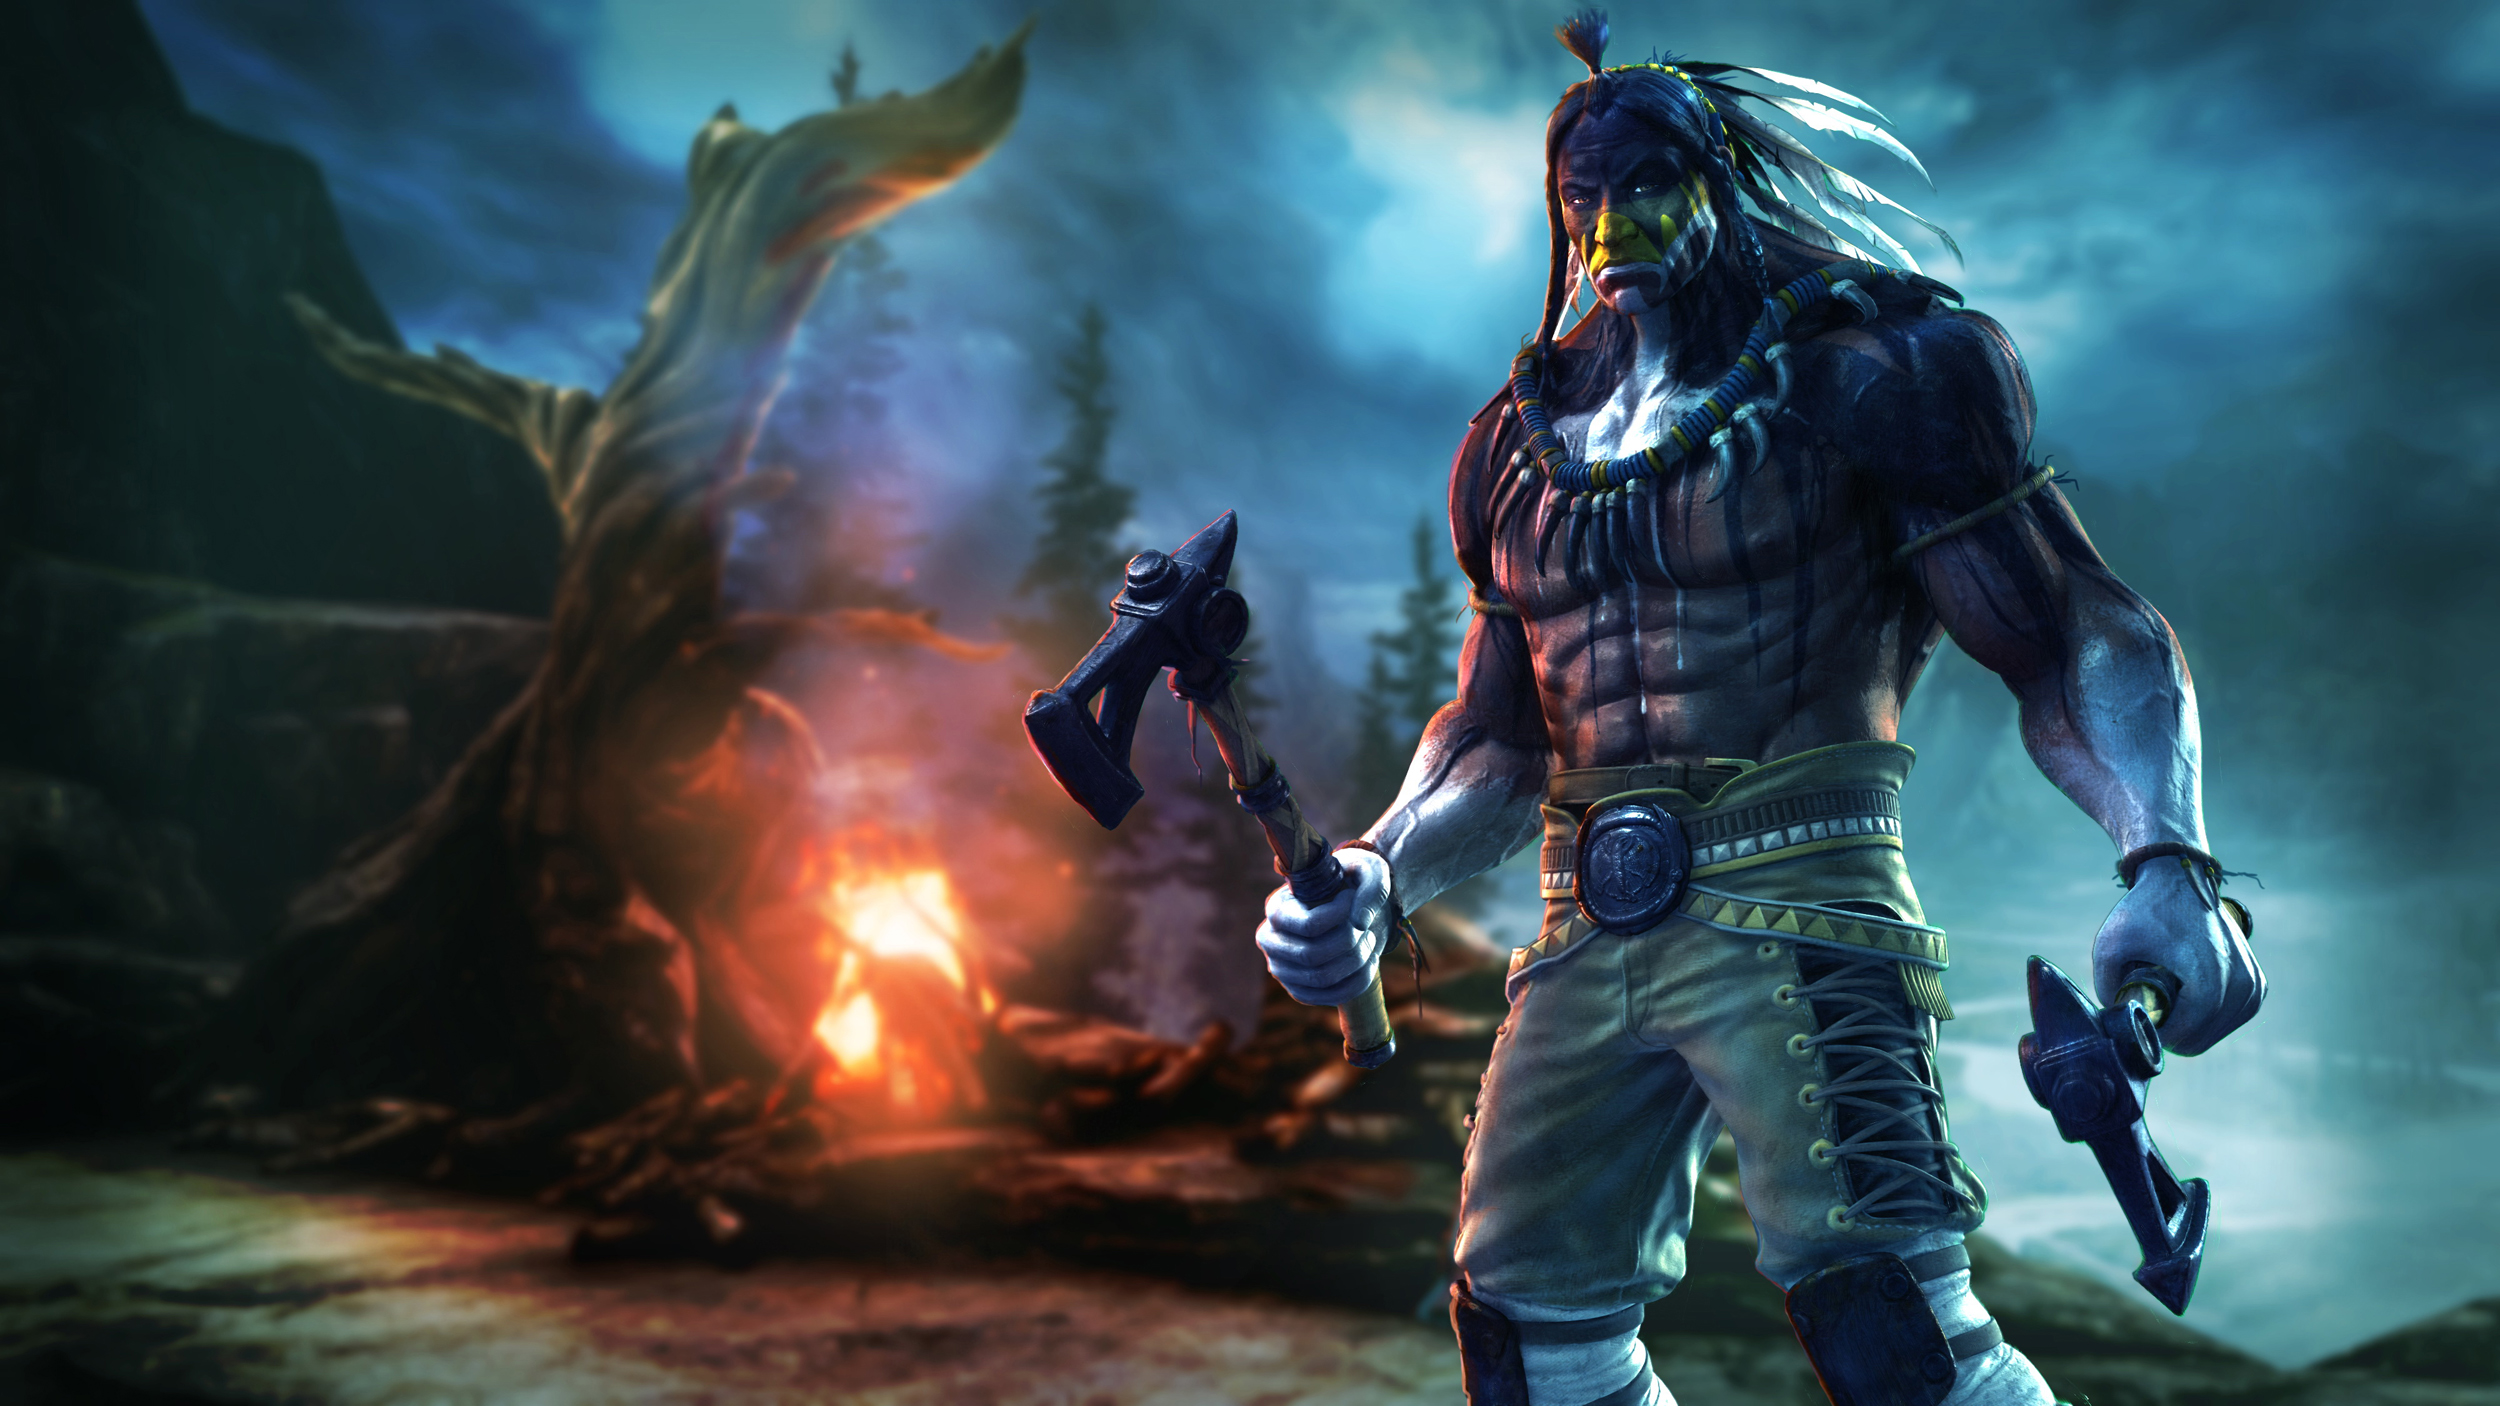 V bojovce Killer Instinct se objeví i Chief Thunder 86232